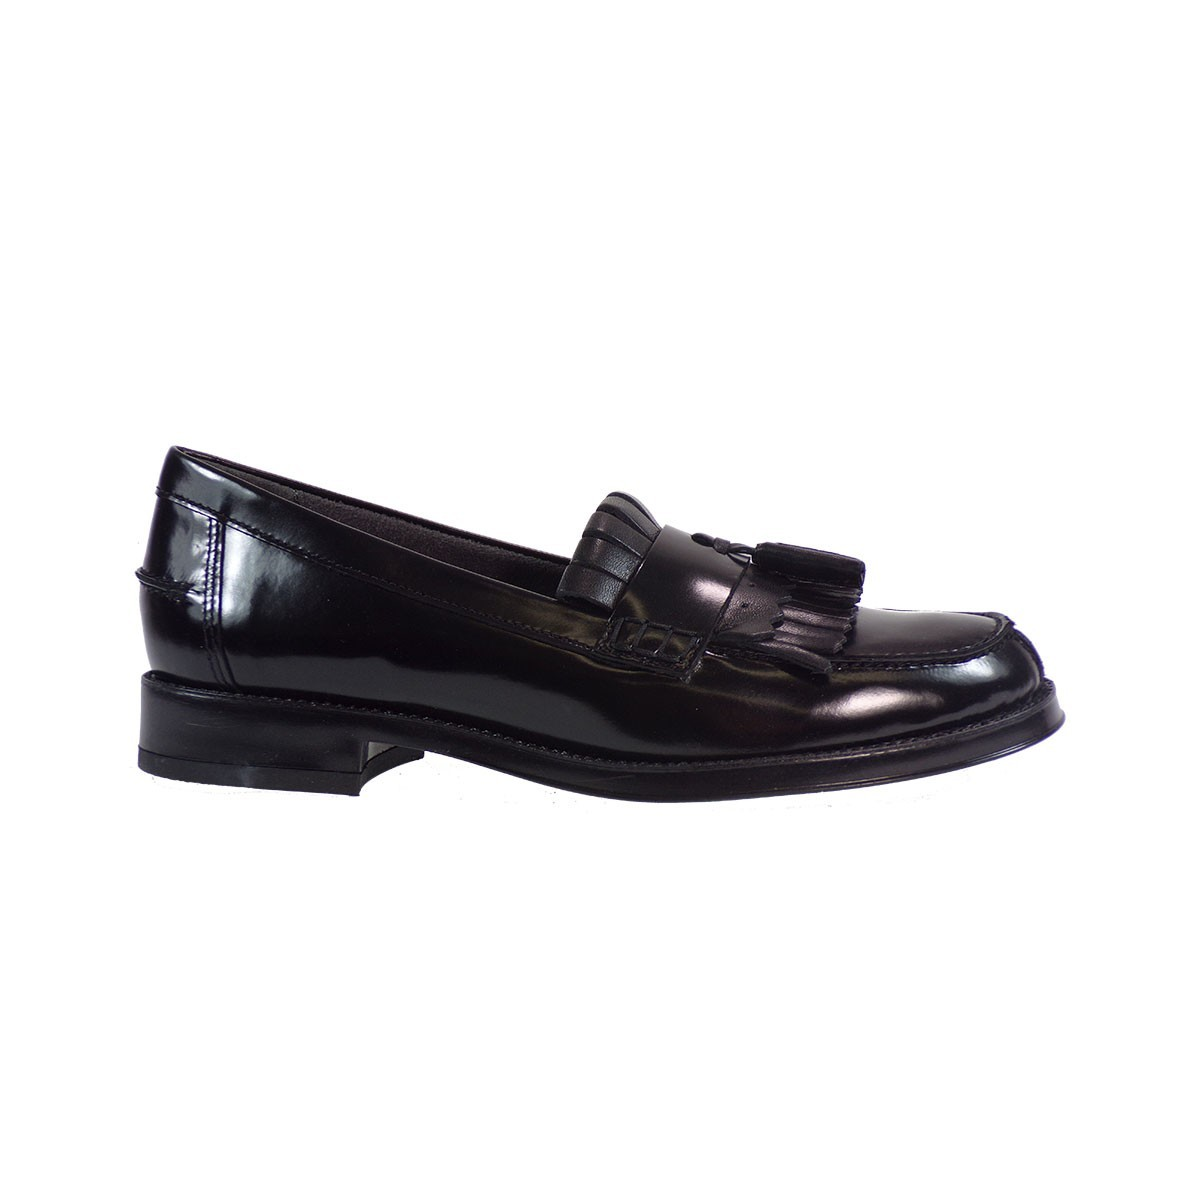 ffffd6b26e4 Aerosoles Shoes Γυναικεία Παπούτσια 86827070 Mαύρο Δέρμα – IShoeStore